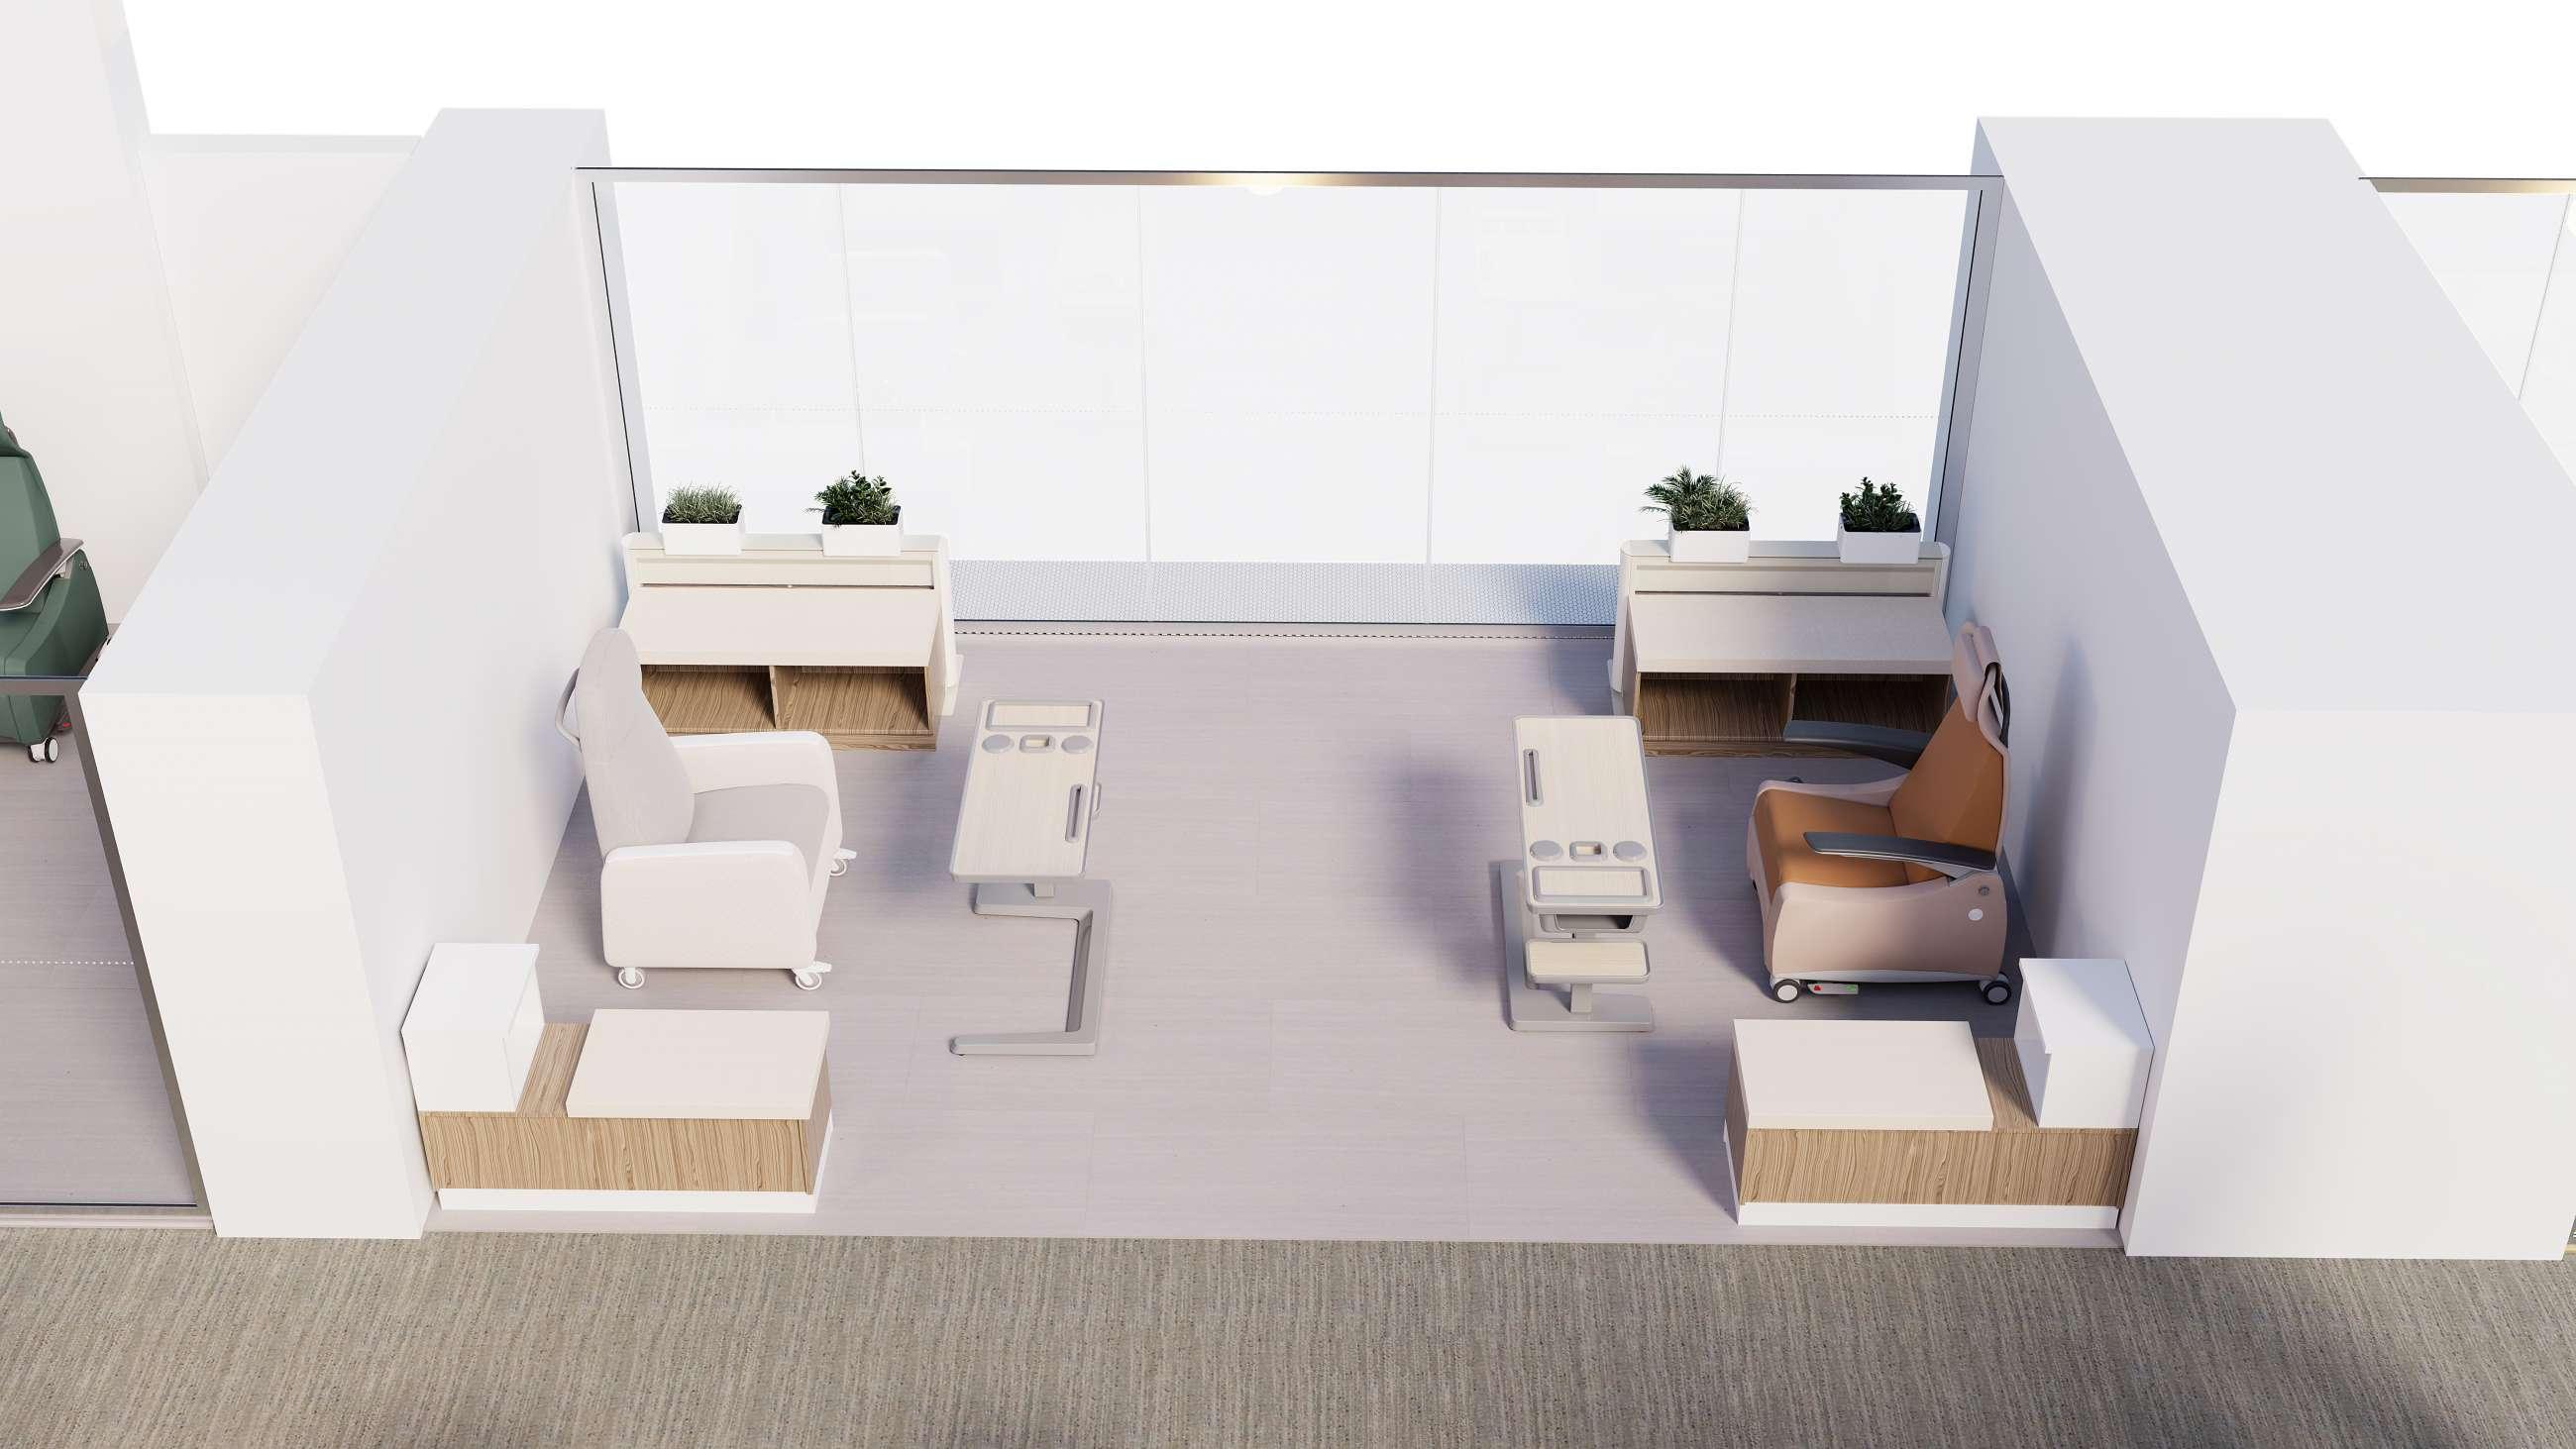 Treatment spaces